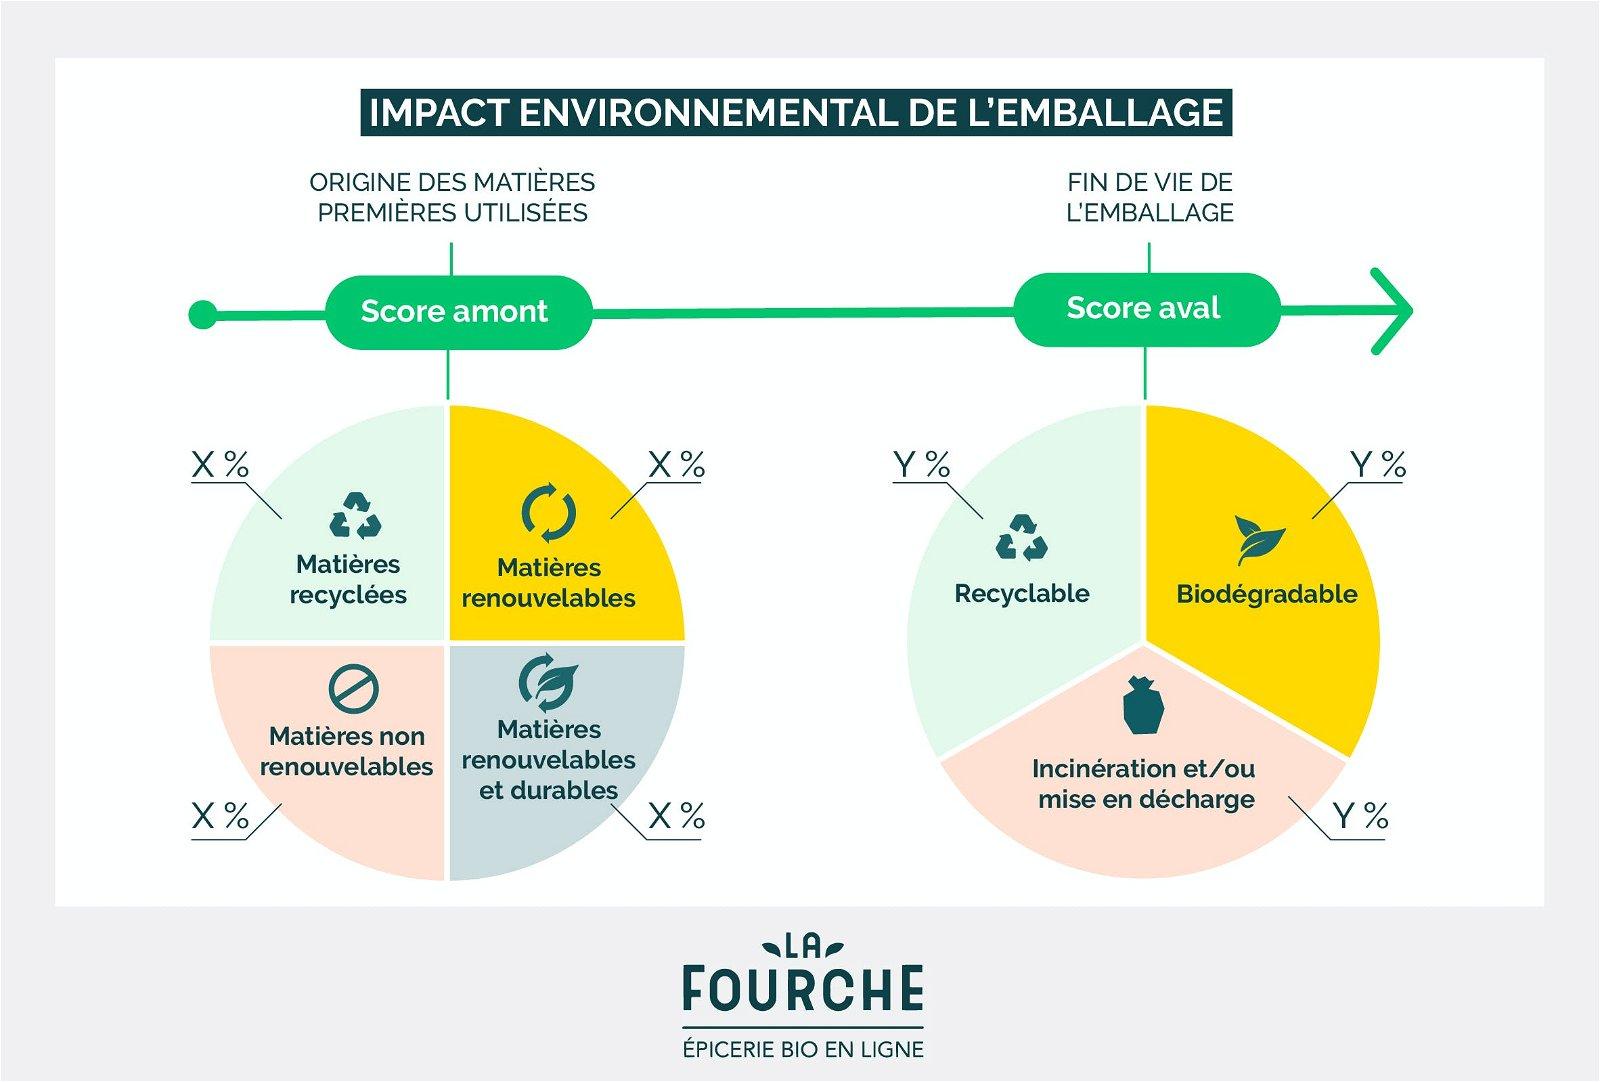 impact environnemental emballage eco-score